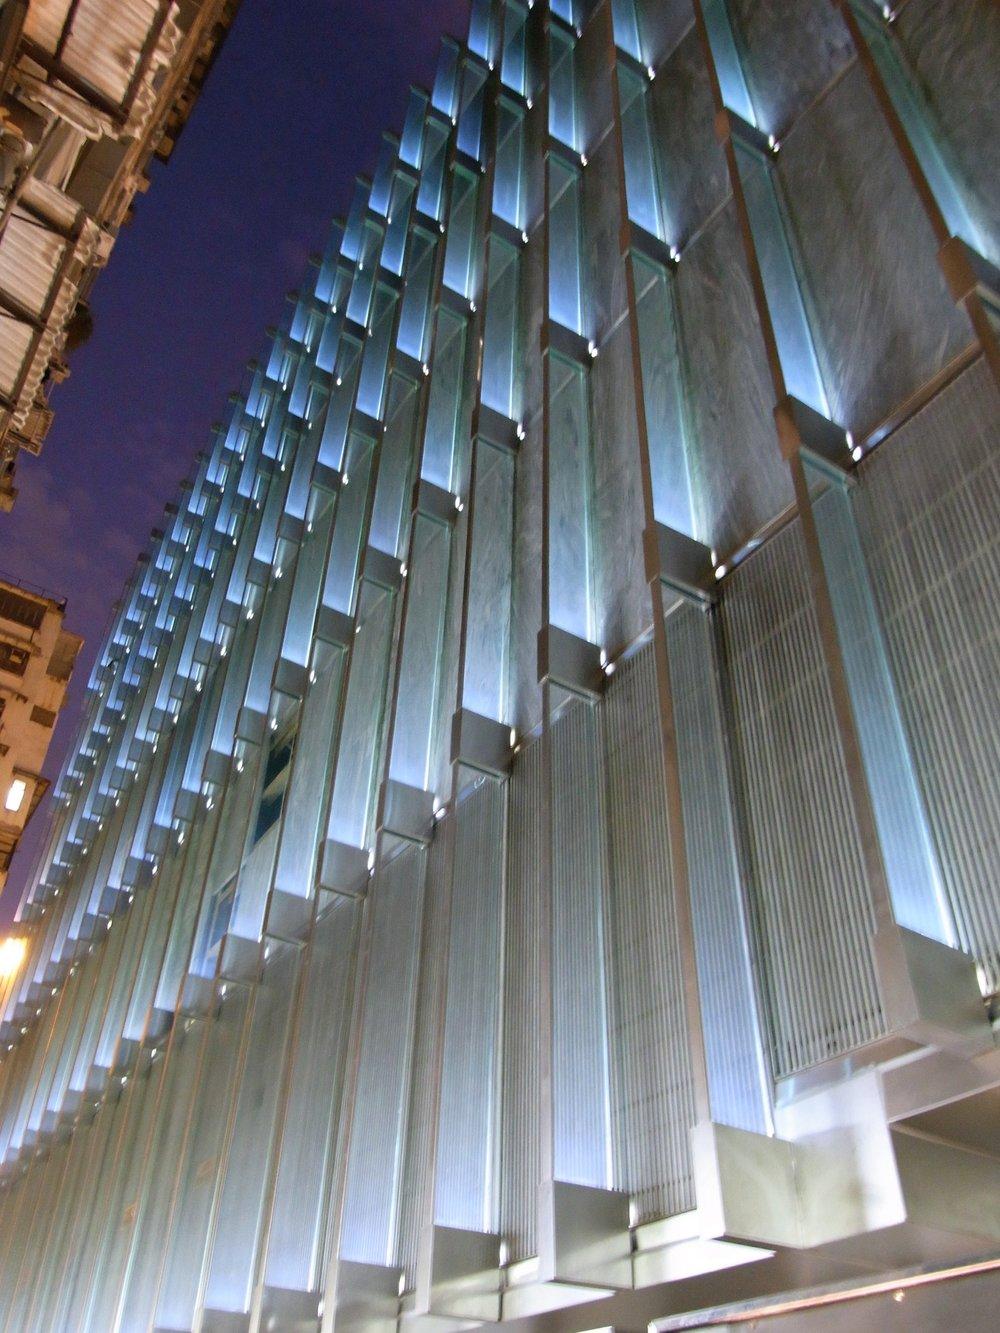 DETAIL OF KERRY CENTRE, HONG KONG